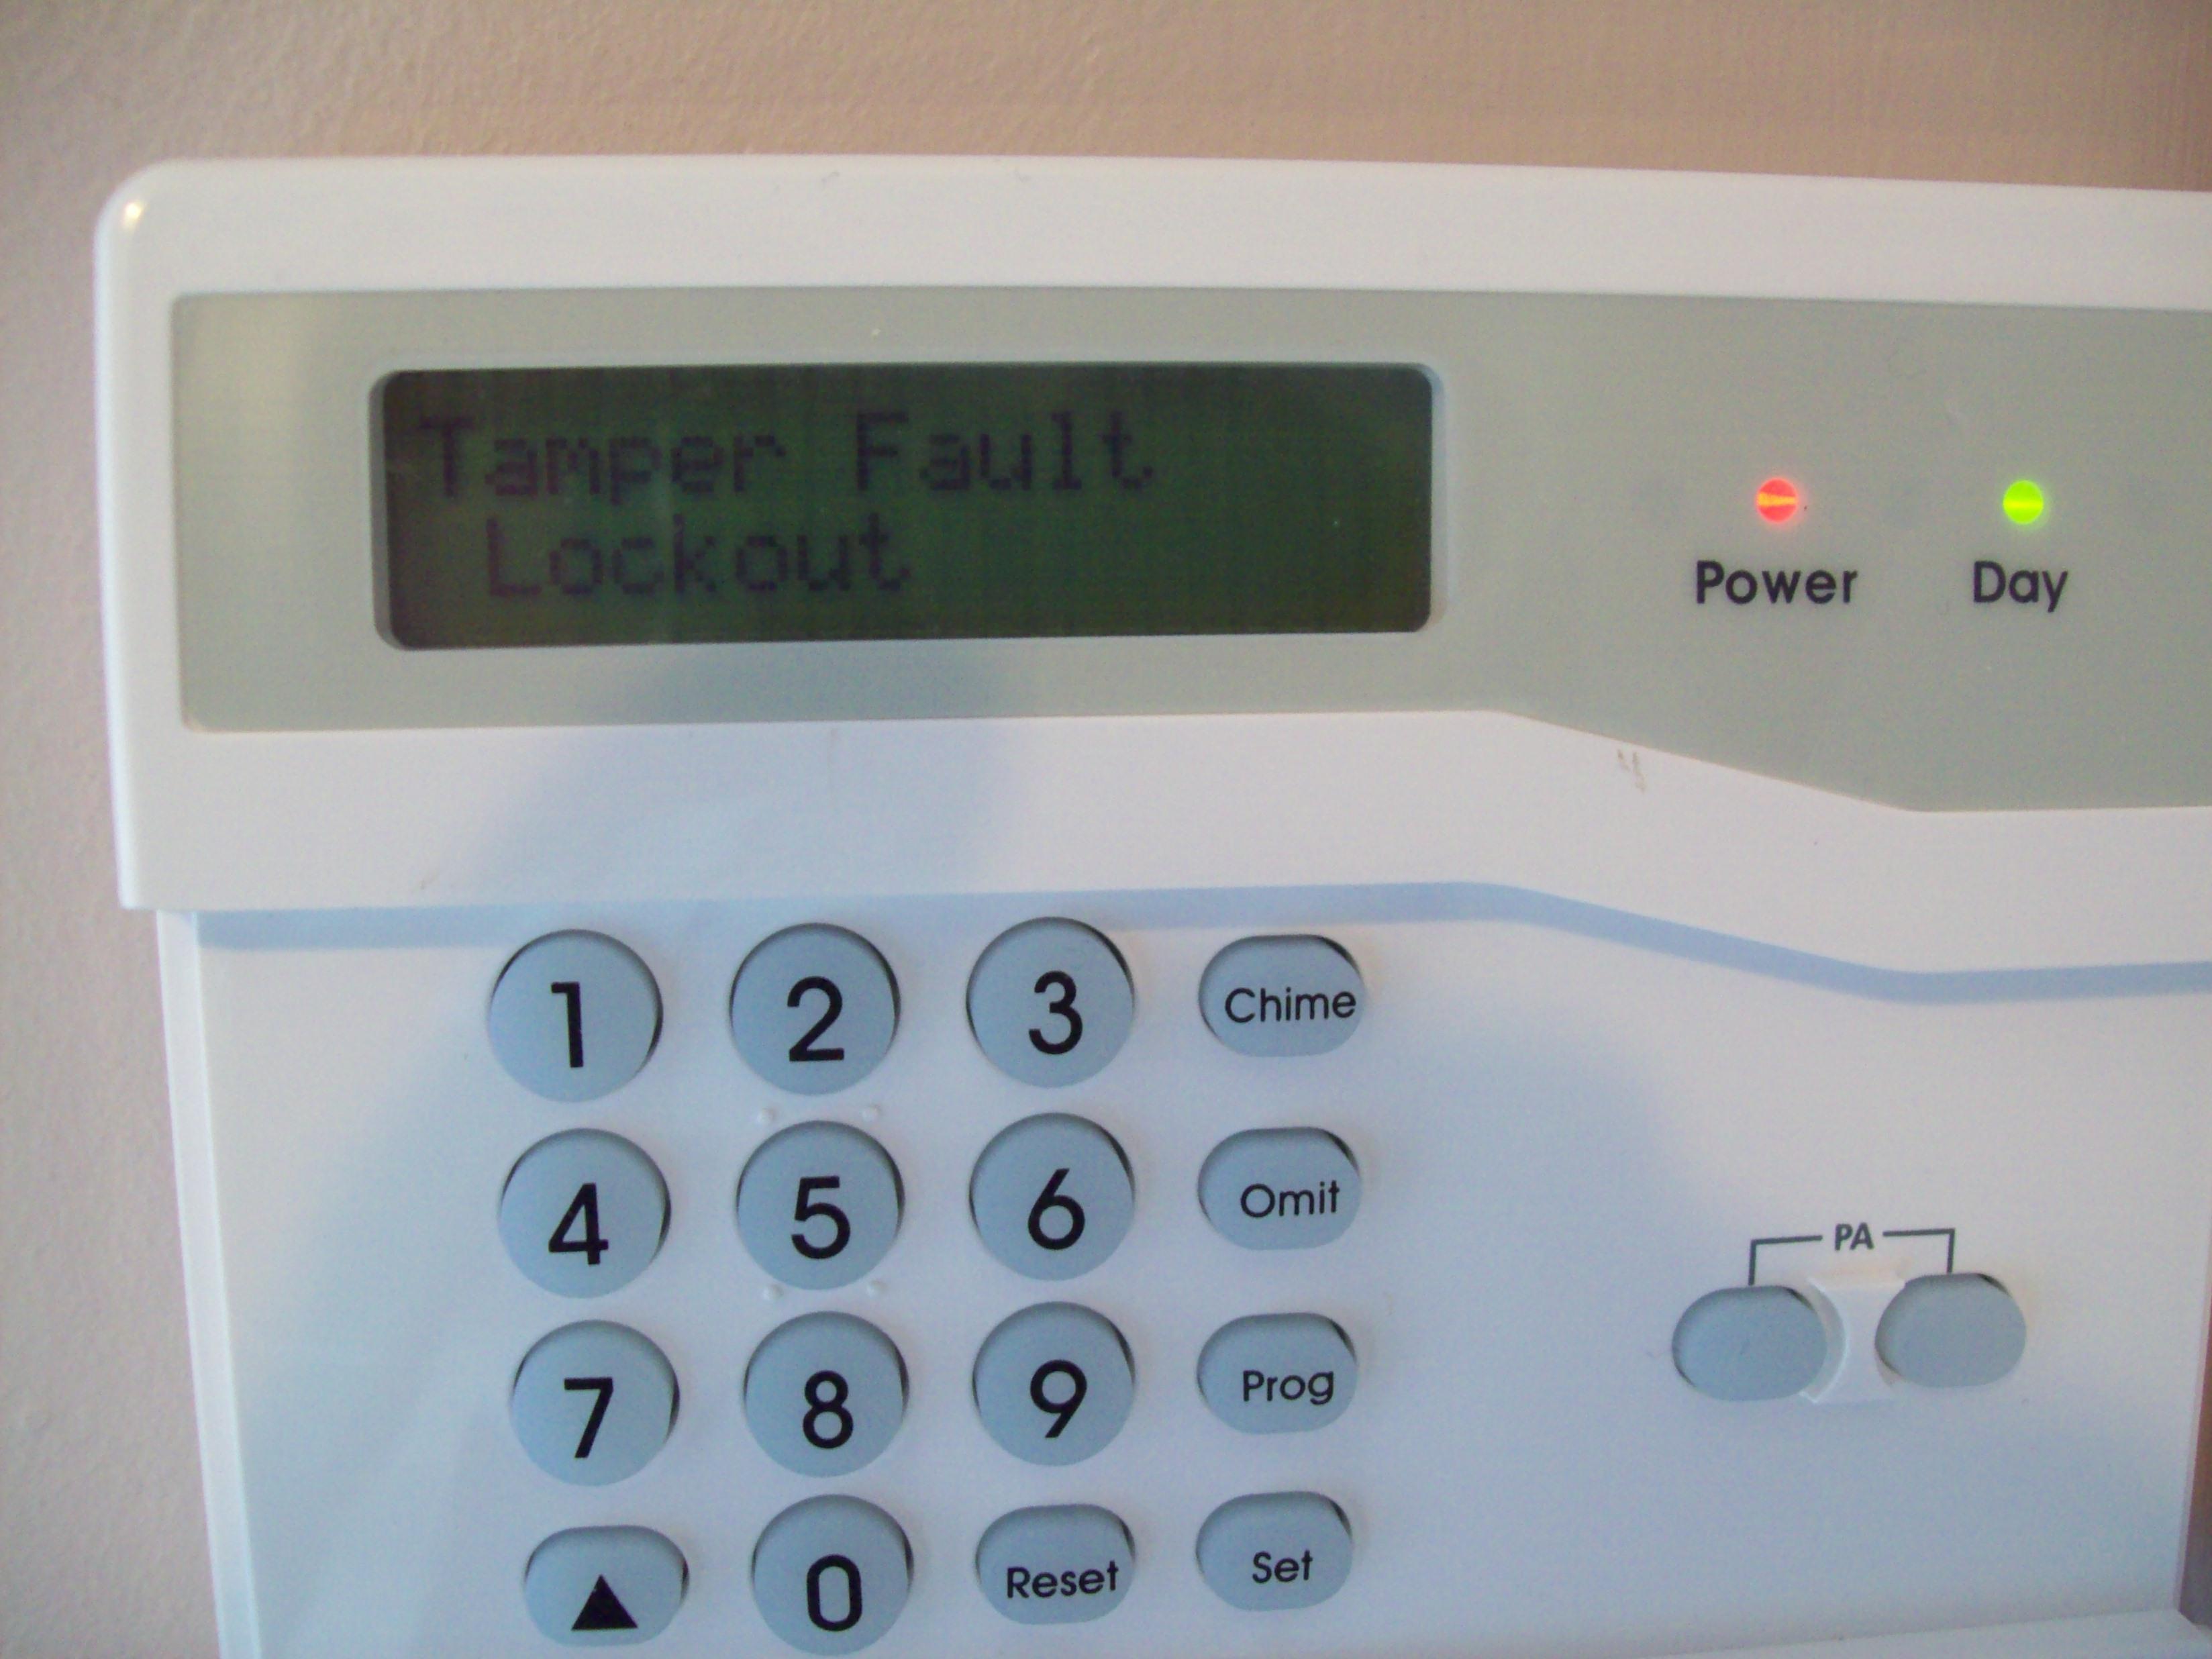 honeywell burglar alarm wiring diagram 1971 honda ct70 i am trying to wire up a accenta gen4 mini with